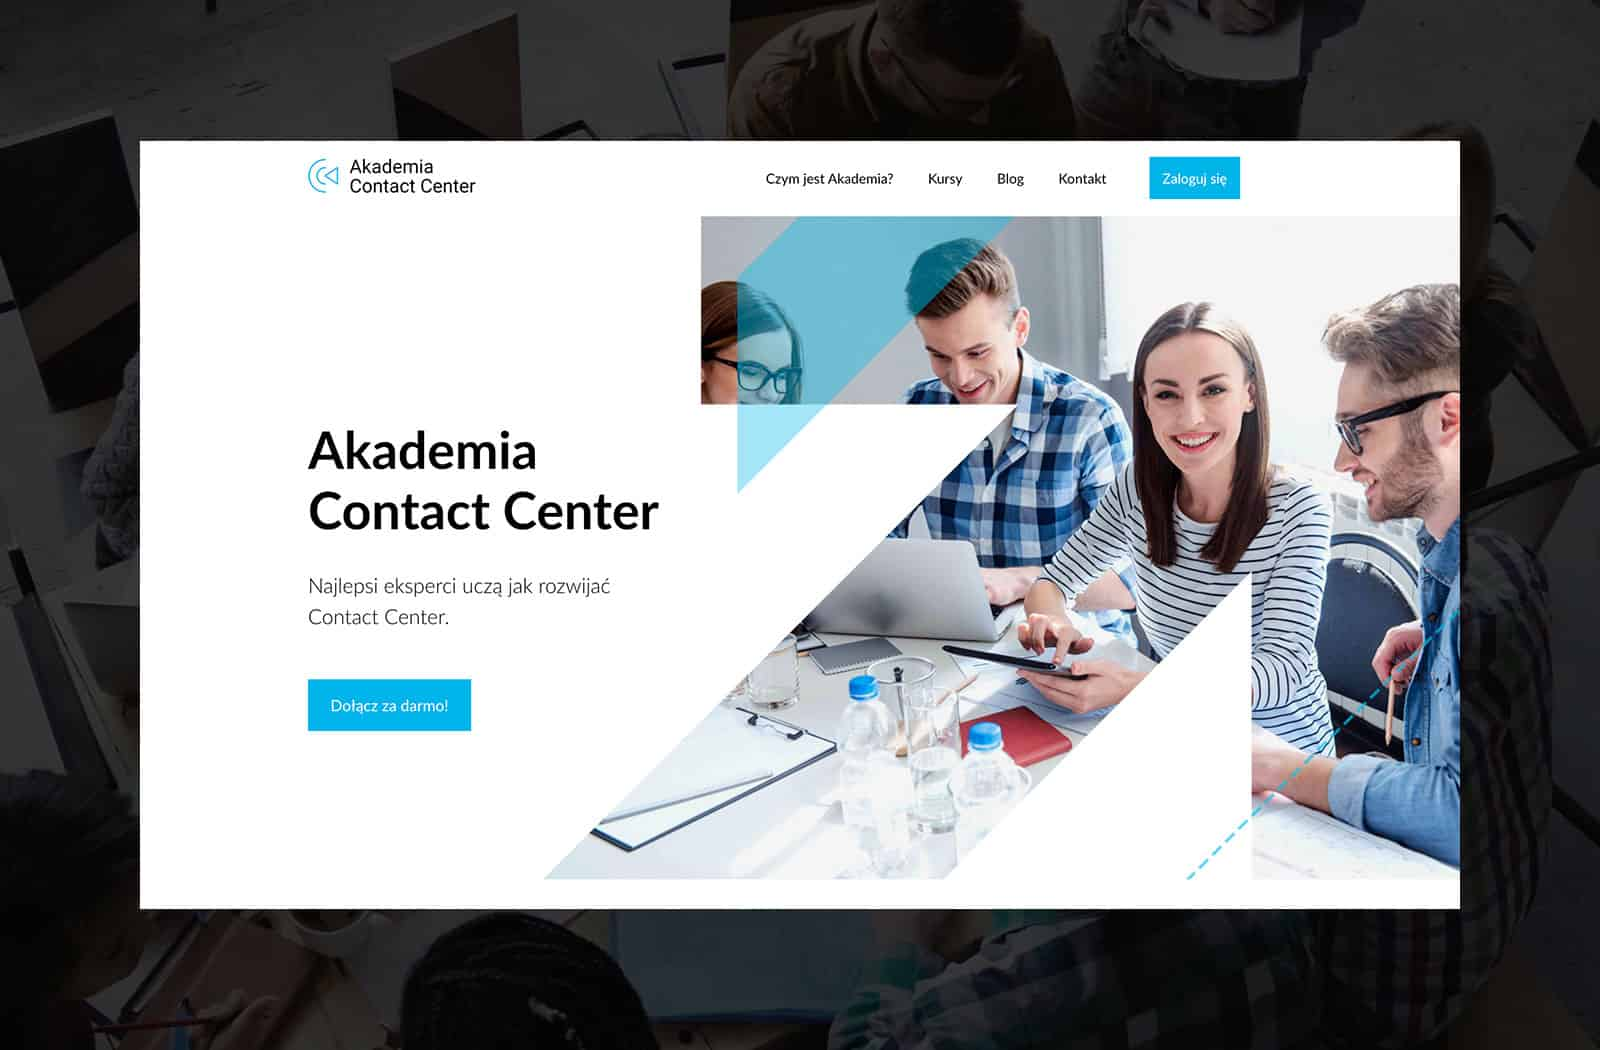 Akademia Contact Center